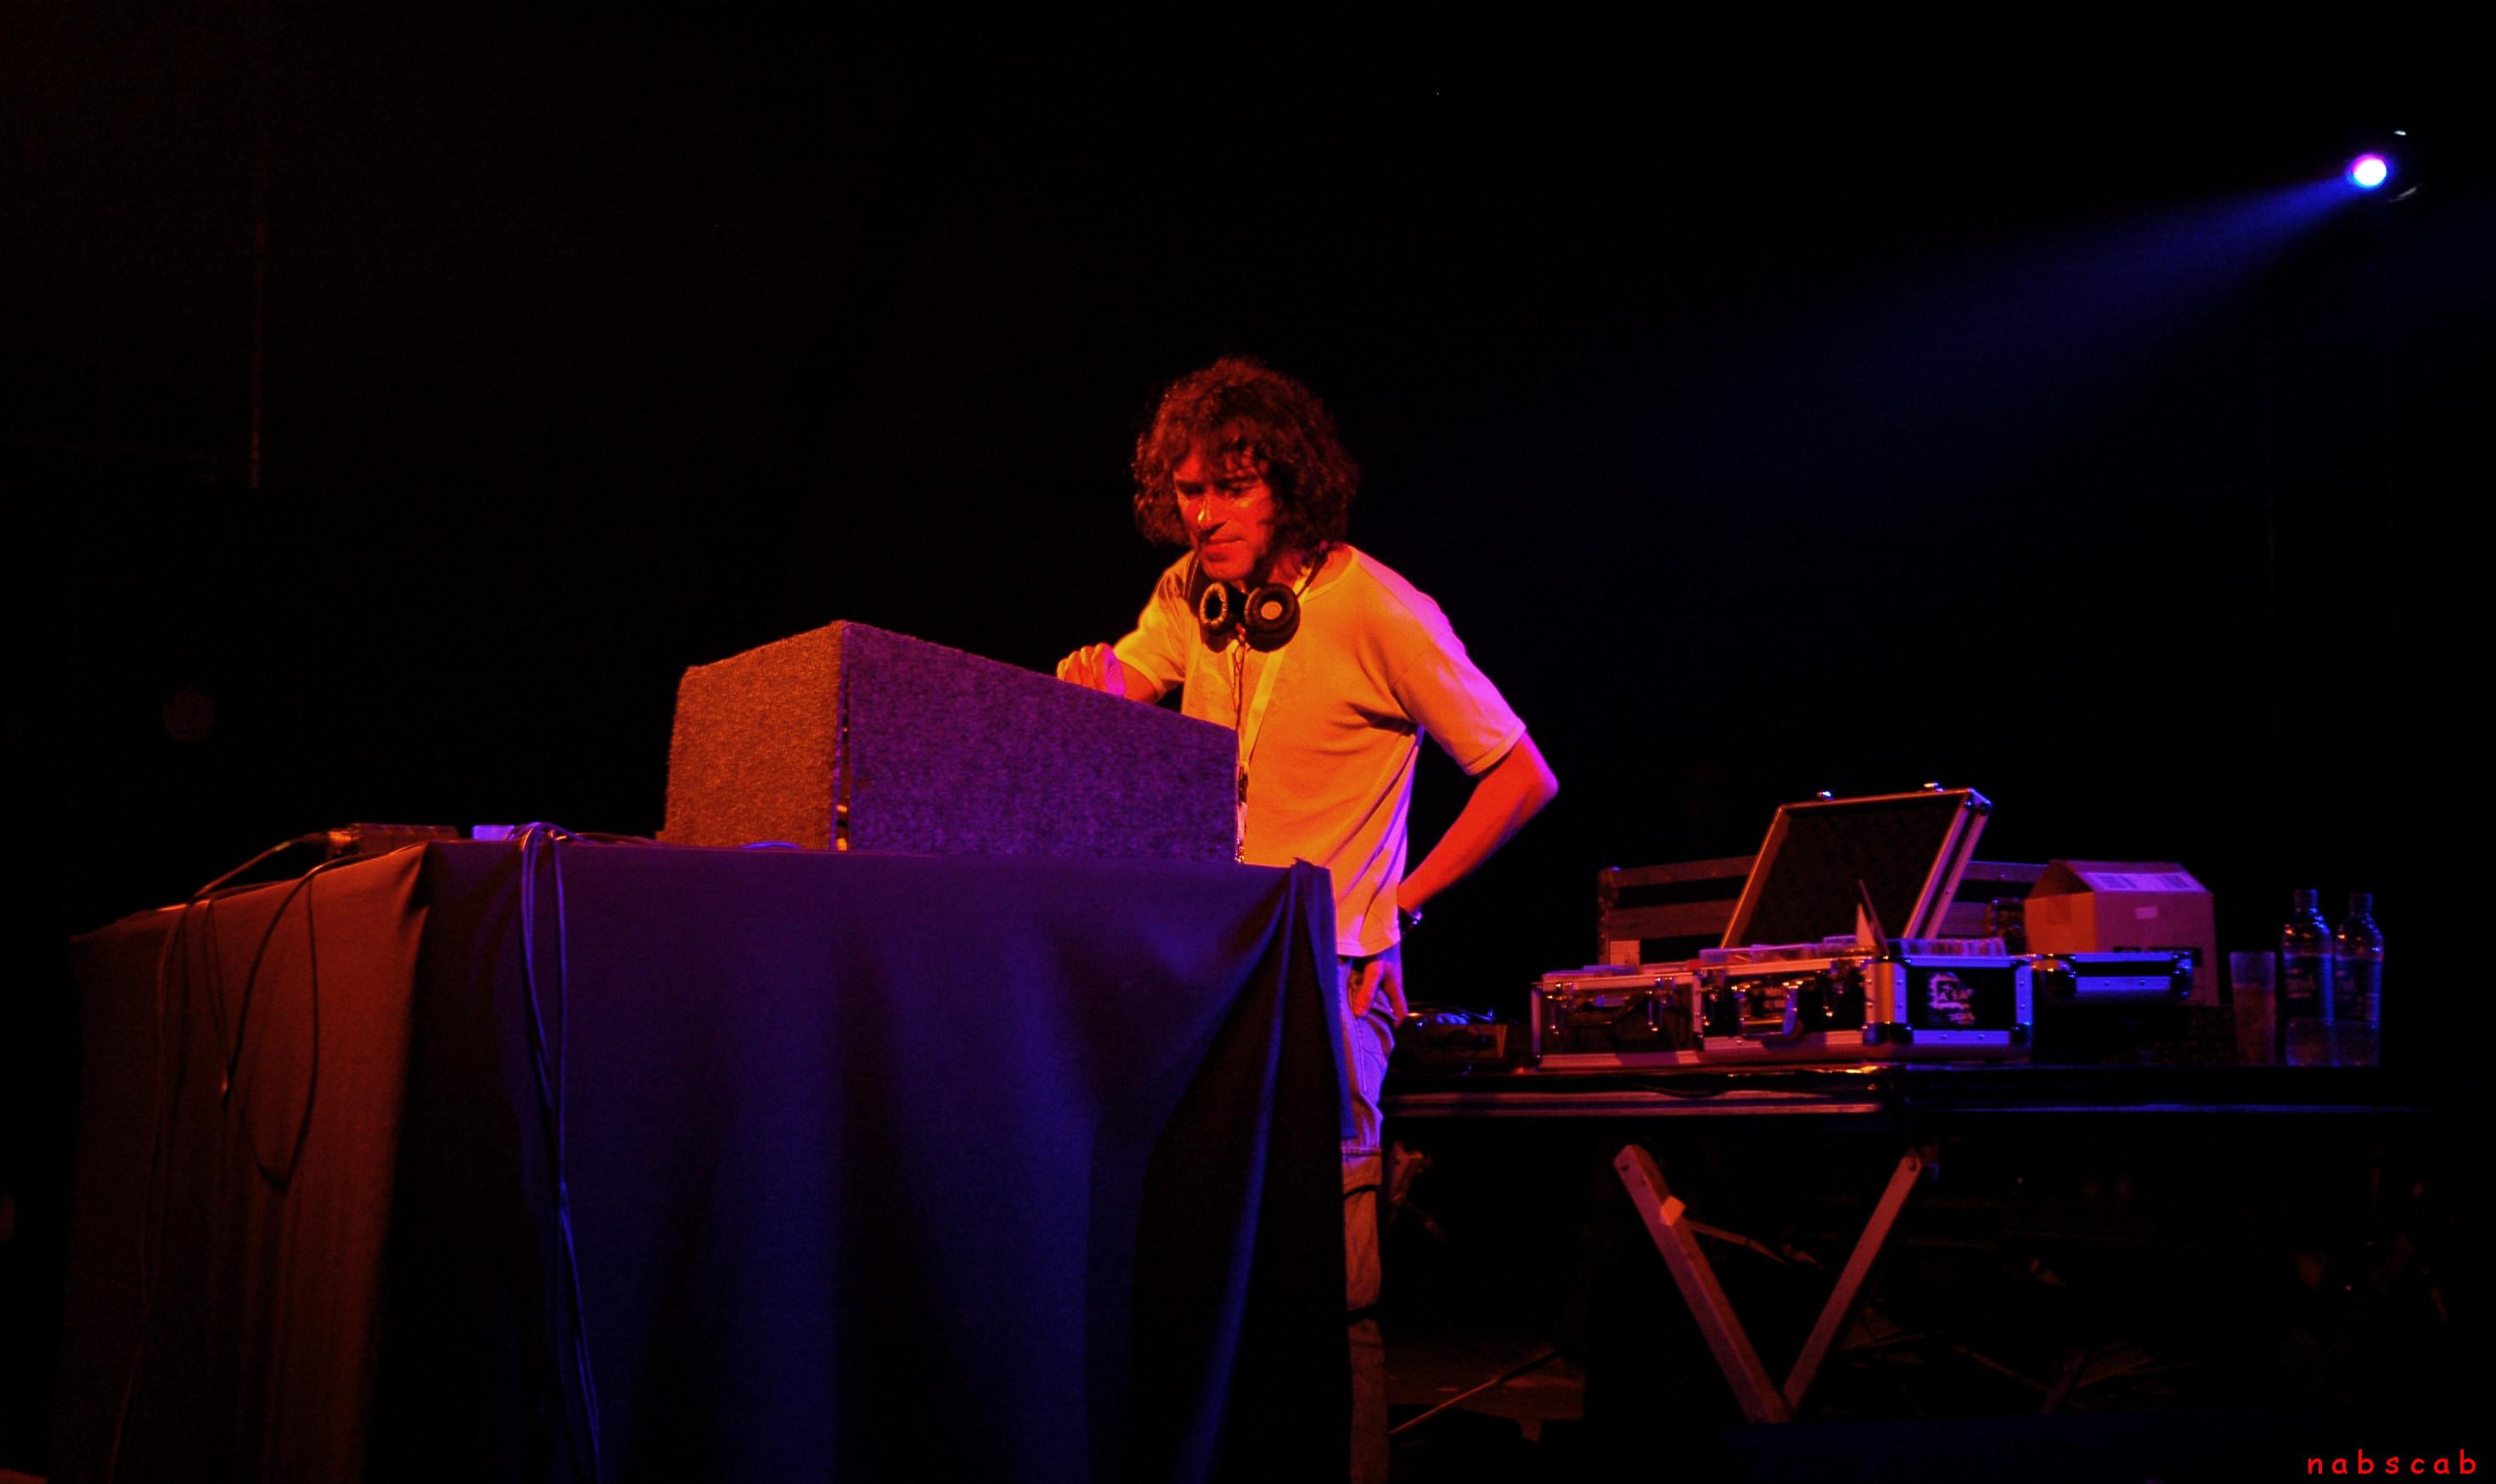 Amable Dj 2007